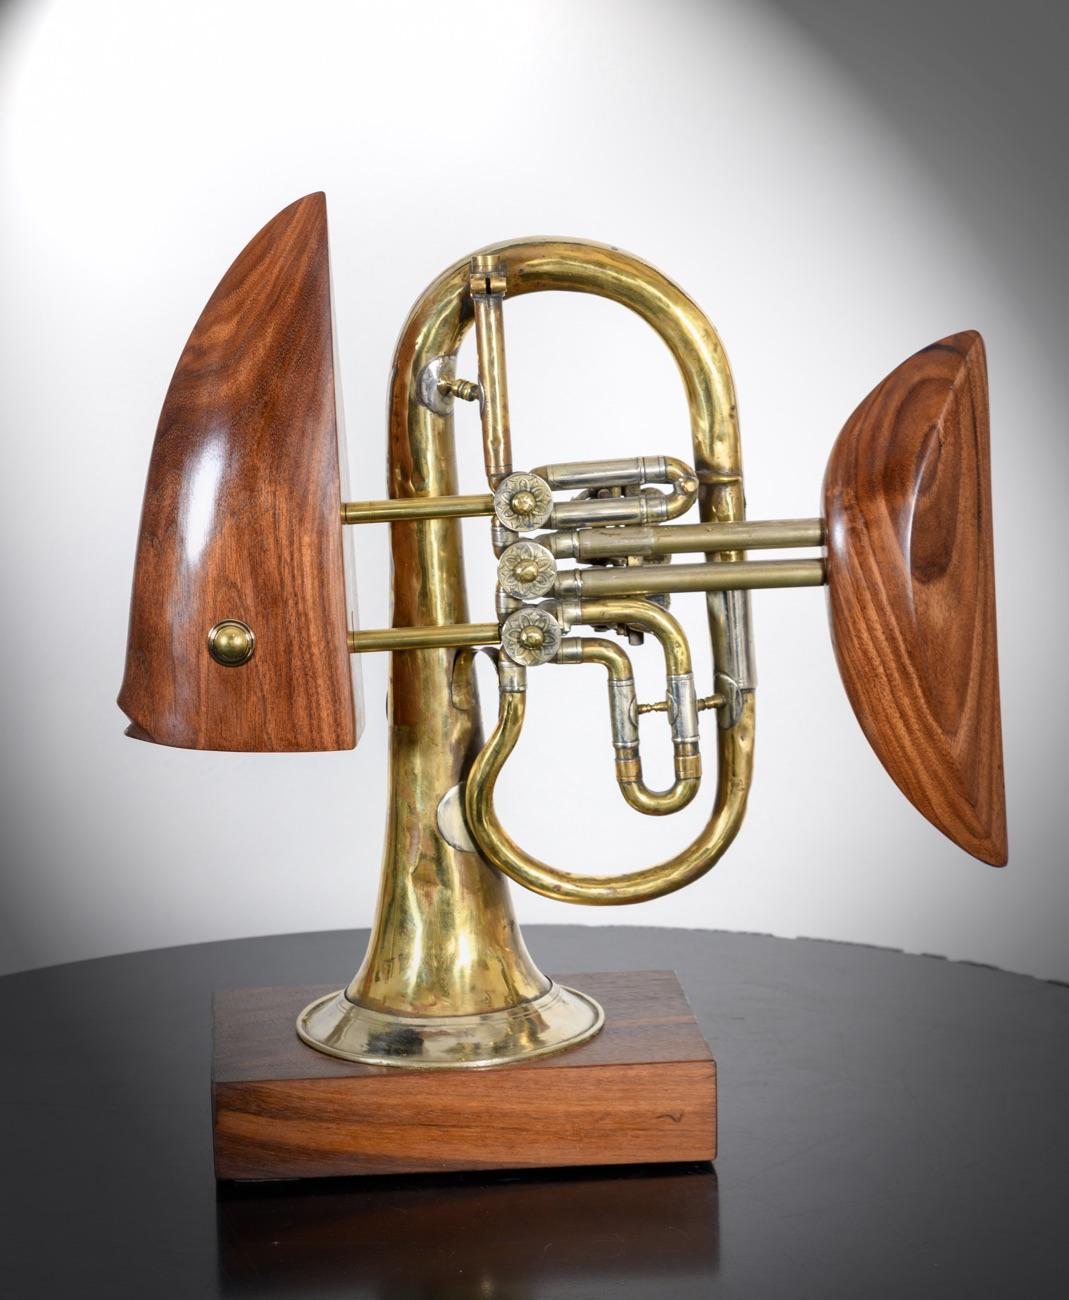 JURAJ ČUTEK New Orleans jazz 44c40 cm